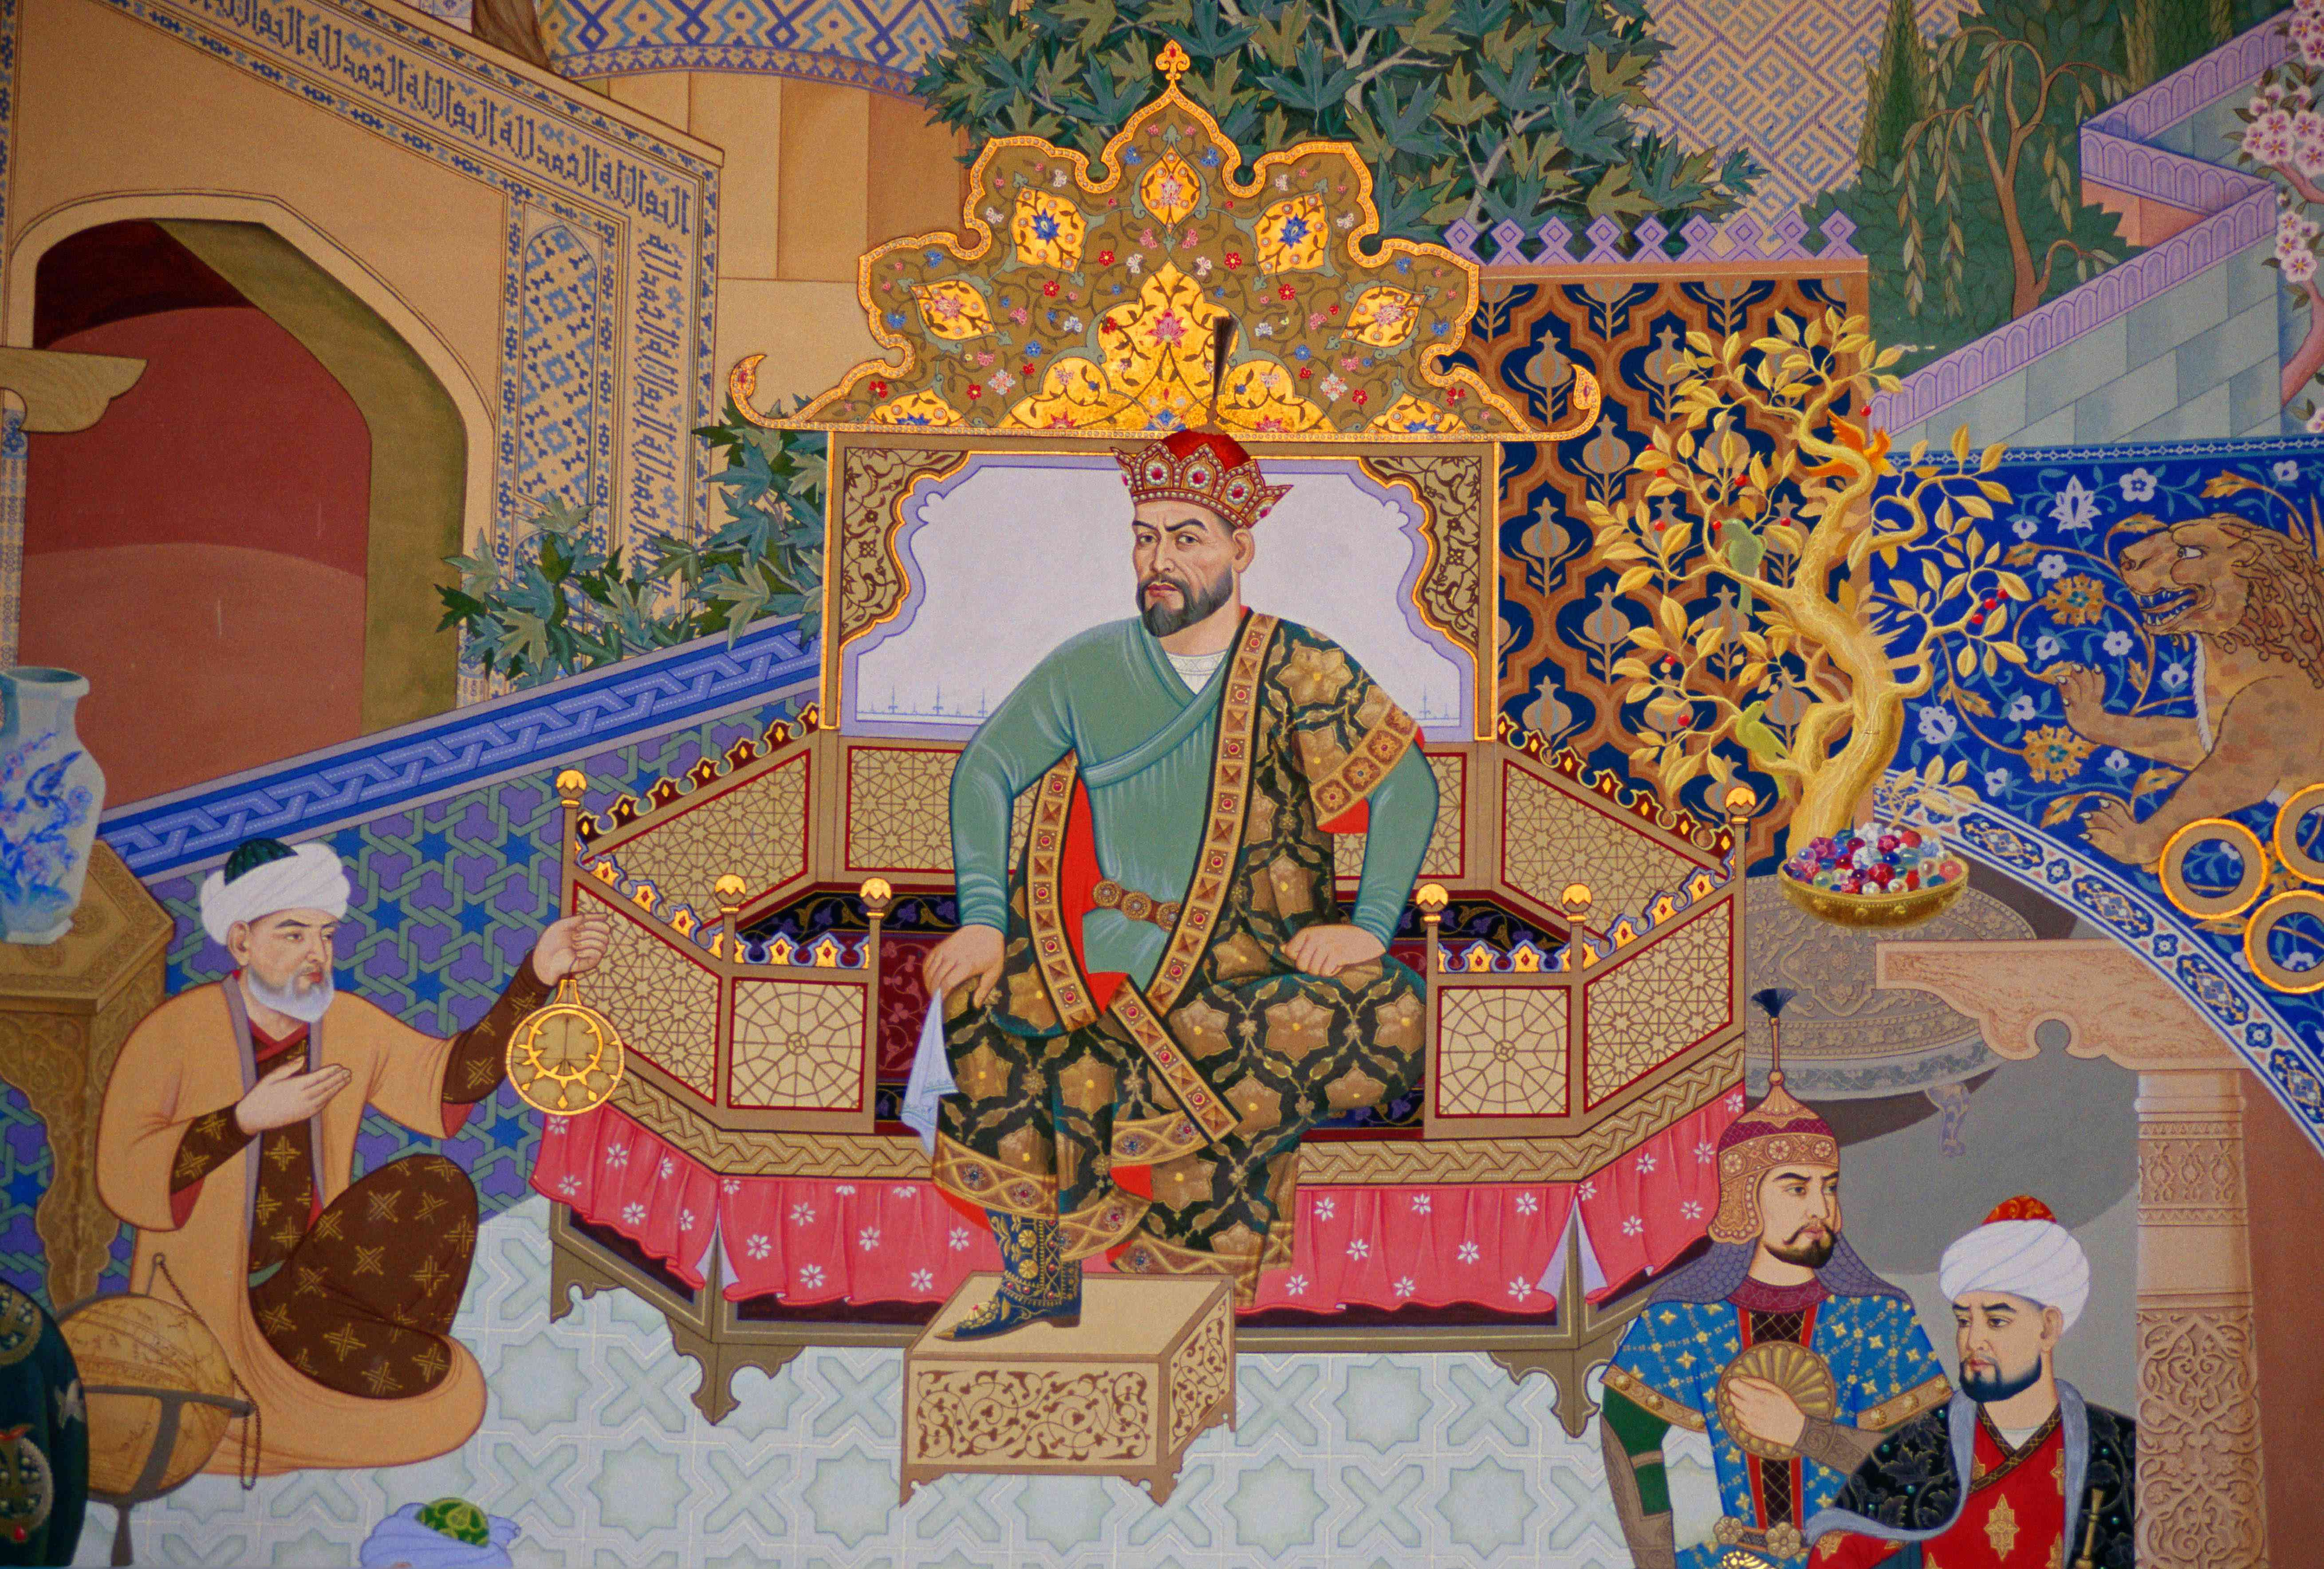 Mural of Tamerlane, Uzbekistan